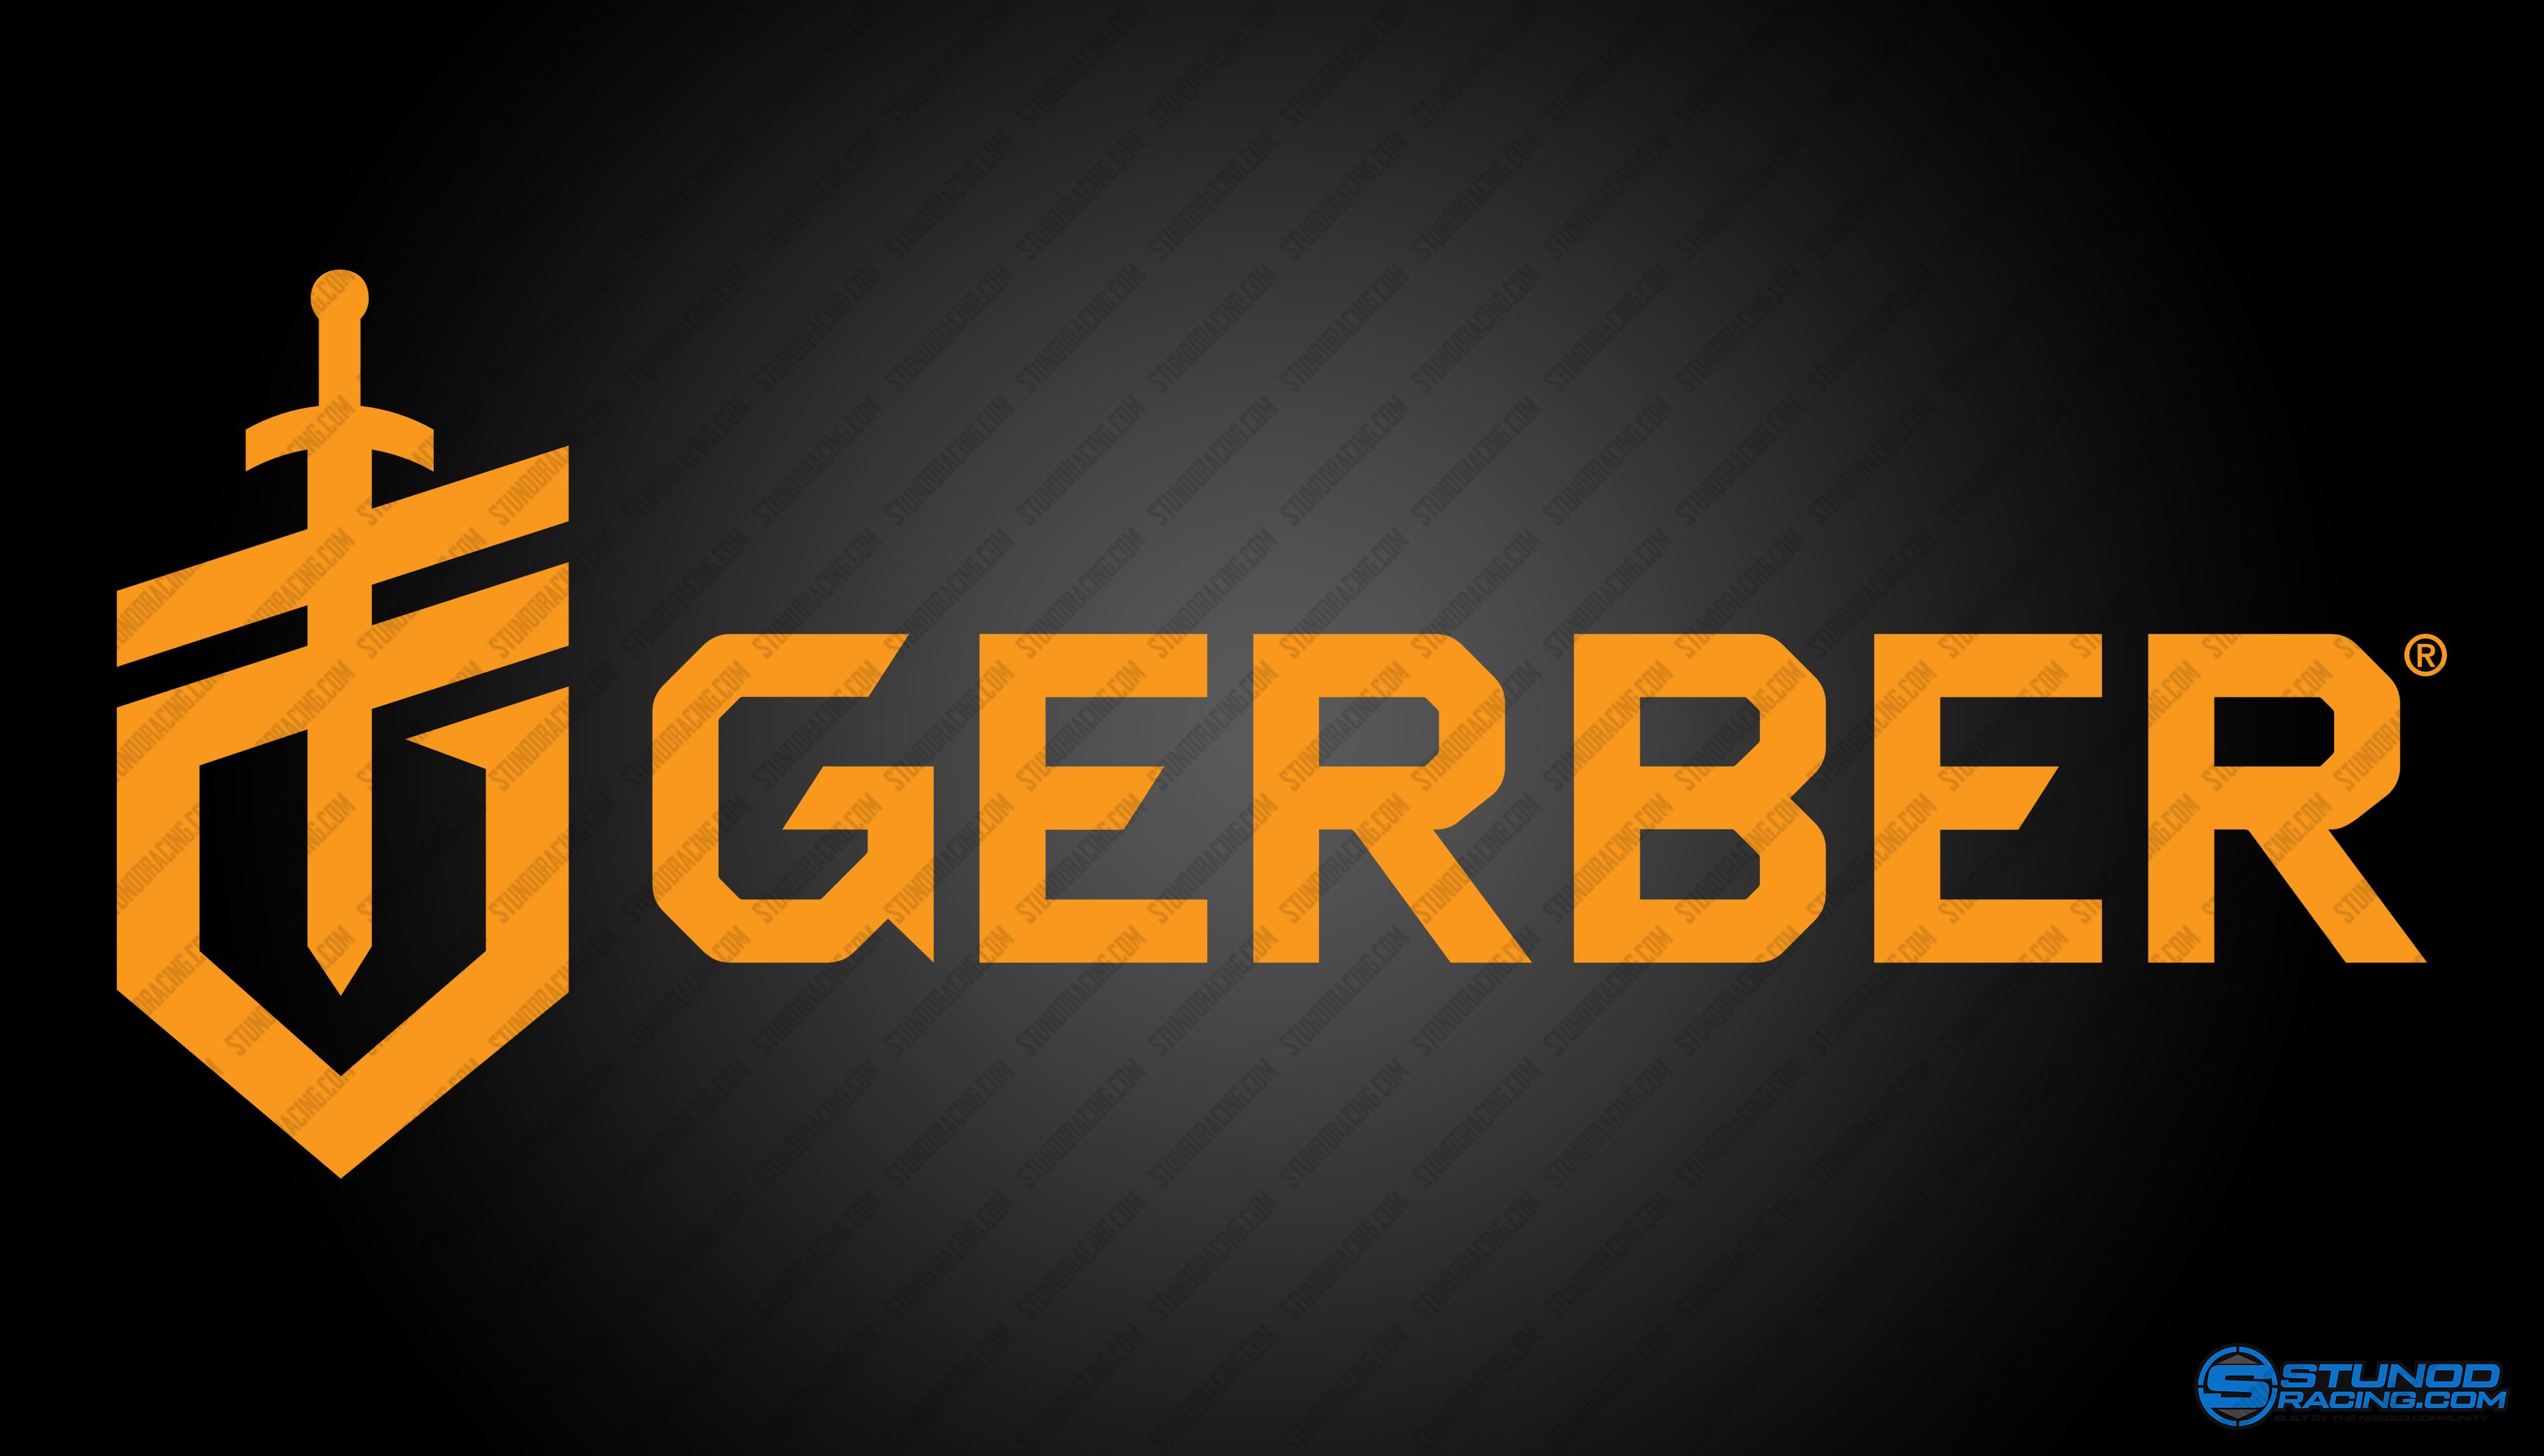 StunodRacing_Gerber_Gear_Logo.jpg